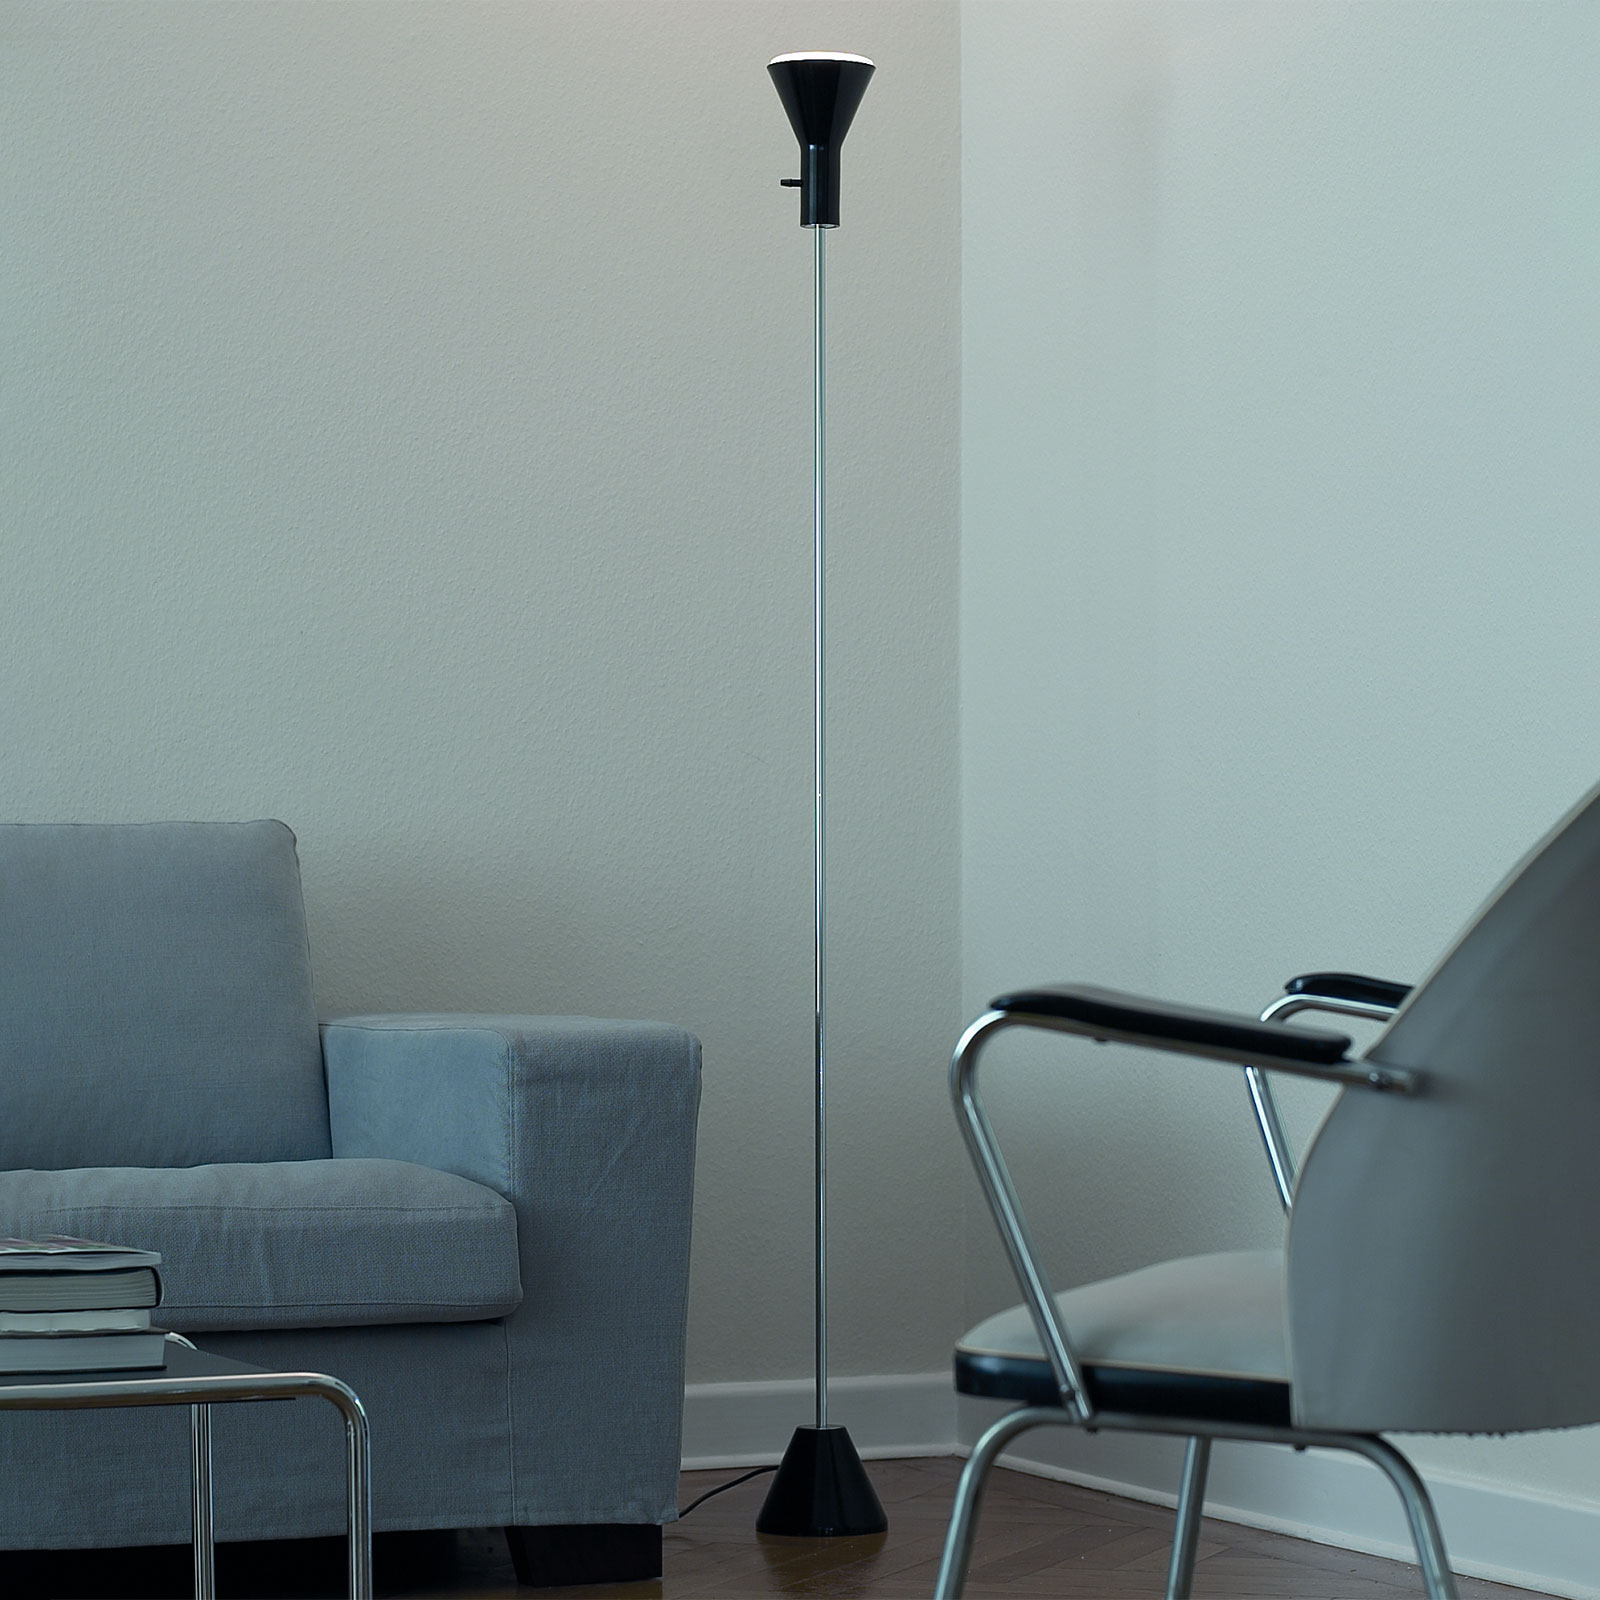 Lampadaire LED fin Gru avec variateur